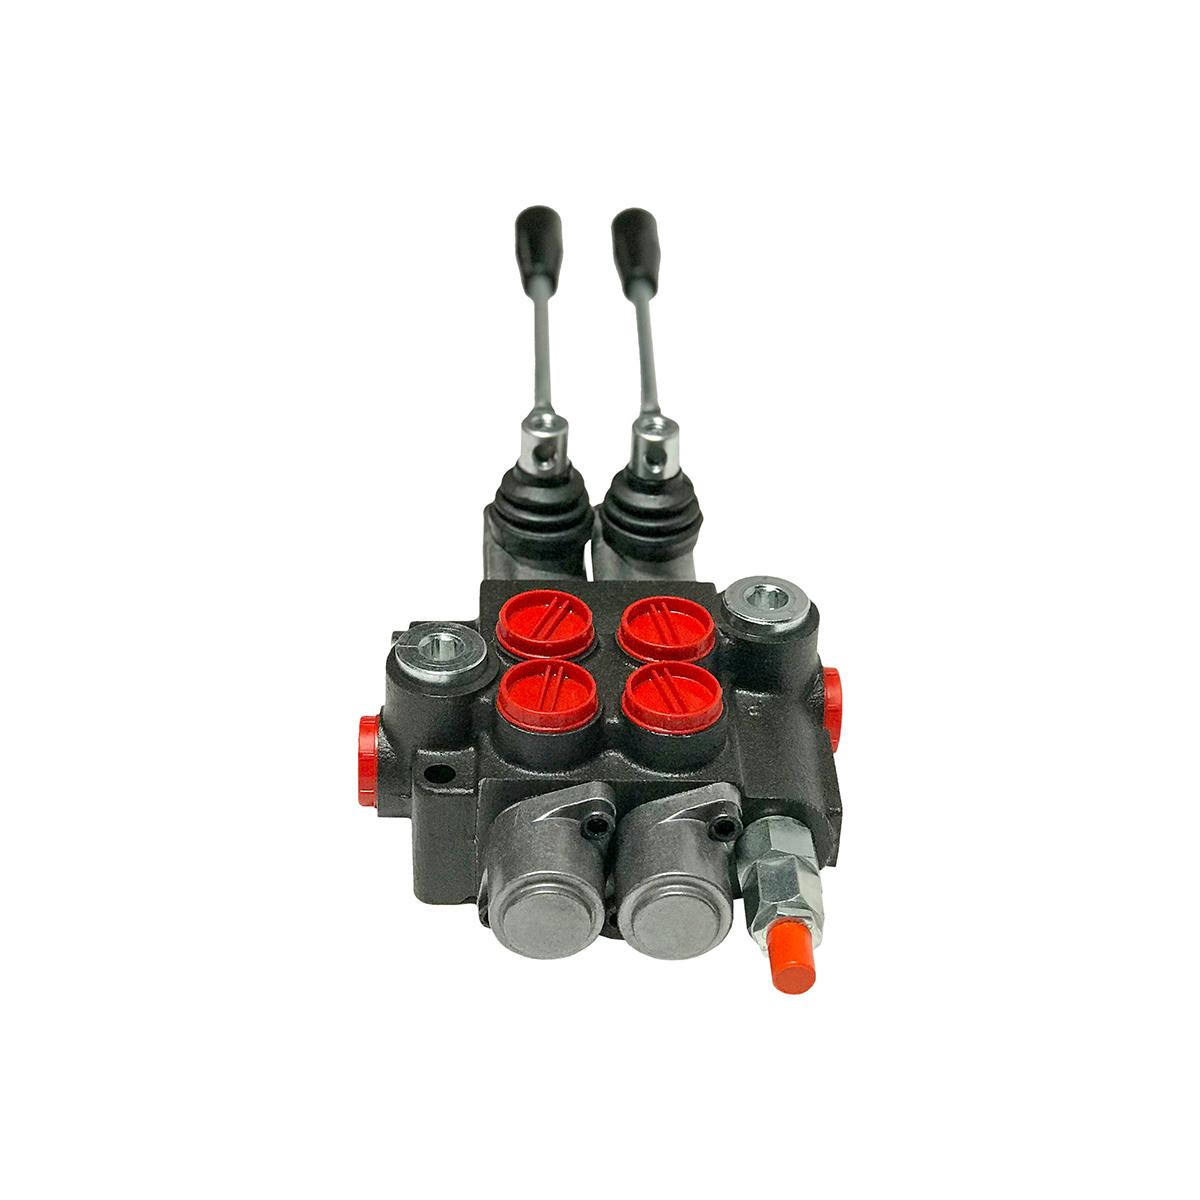 2 spool x 13 GPM hydraulic control valve, monoblock cast iron valve | Magister Hydraulics